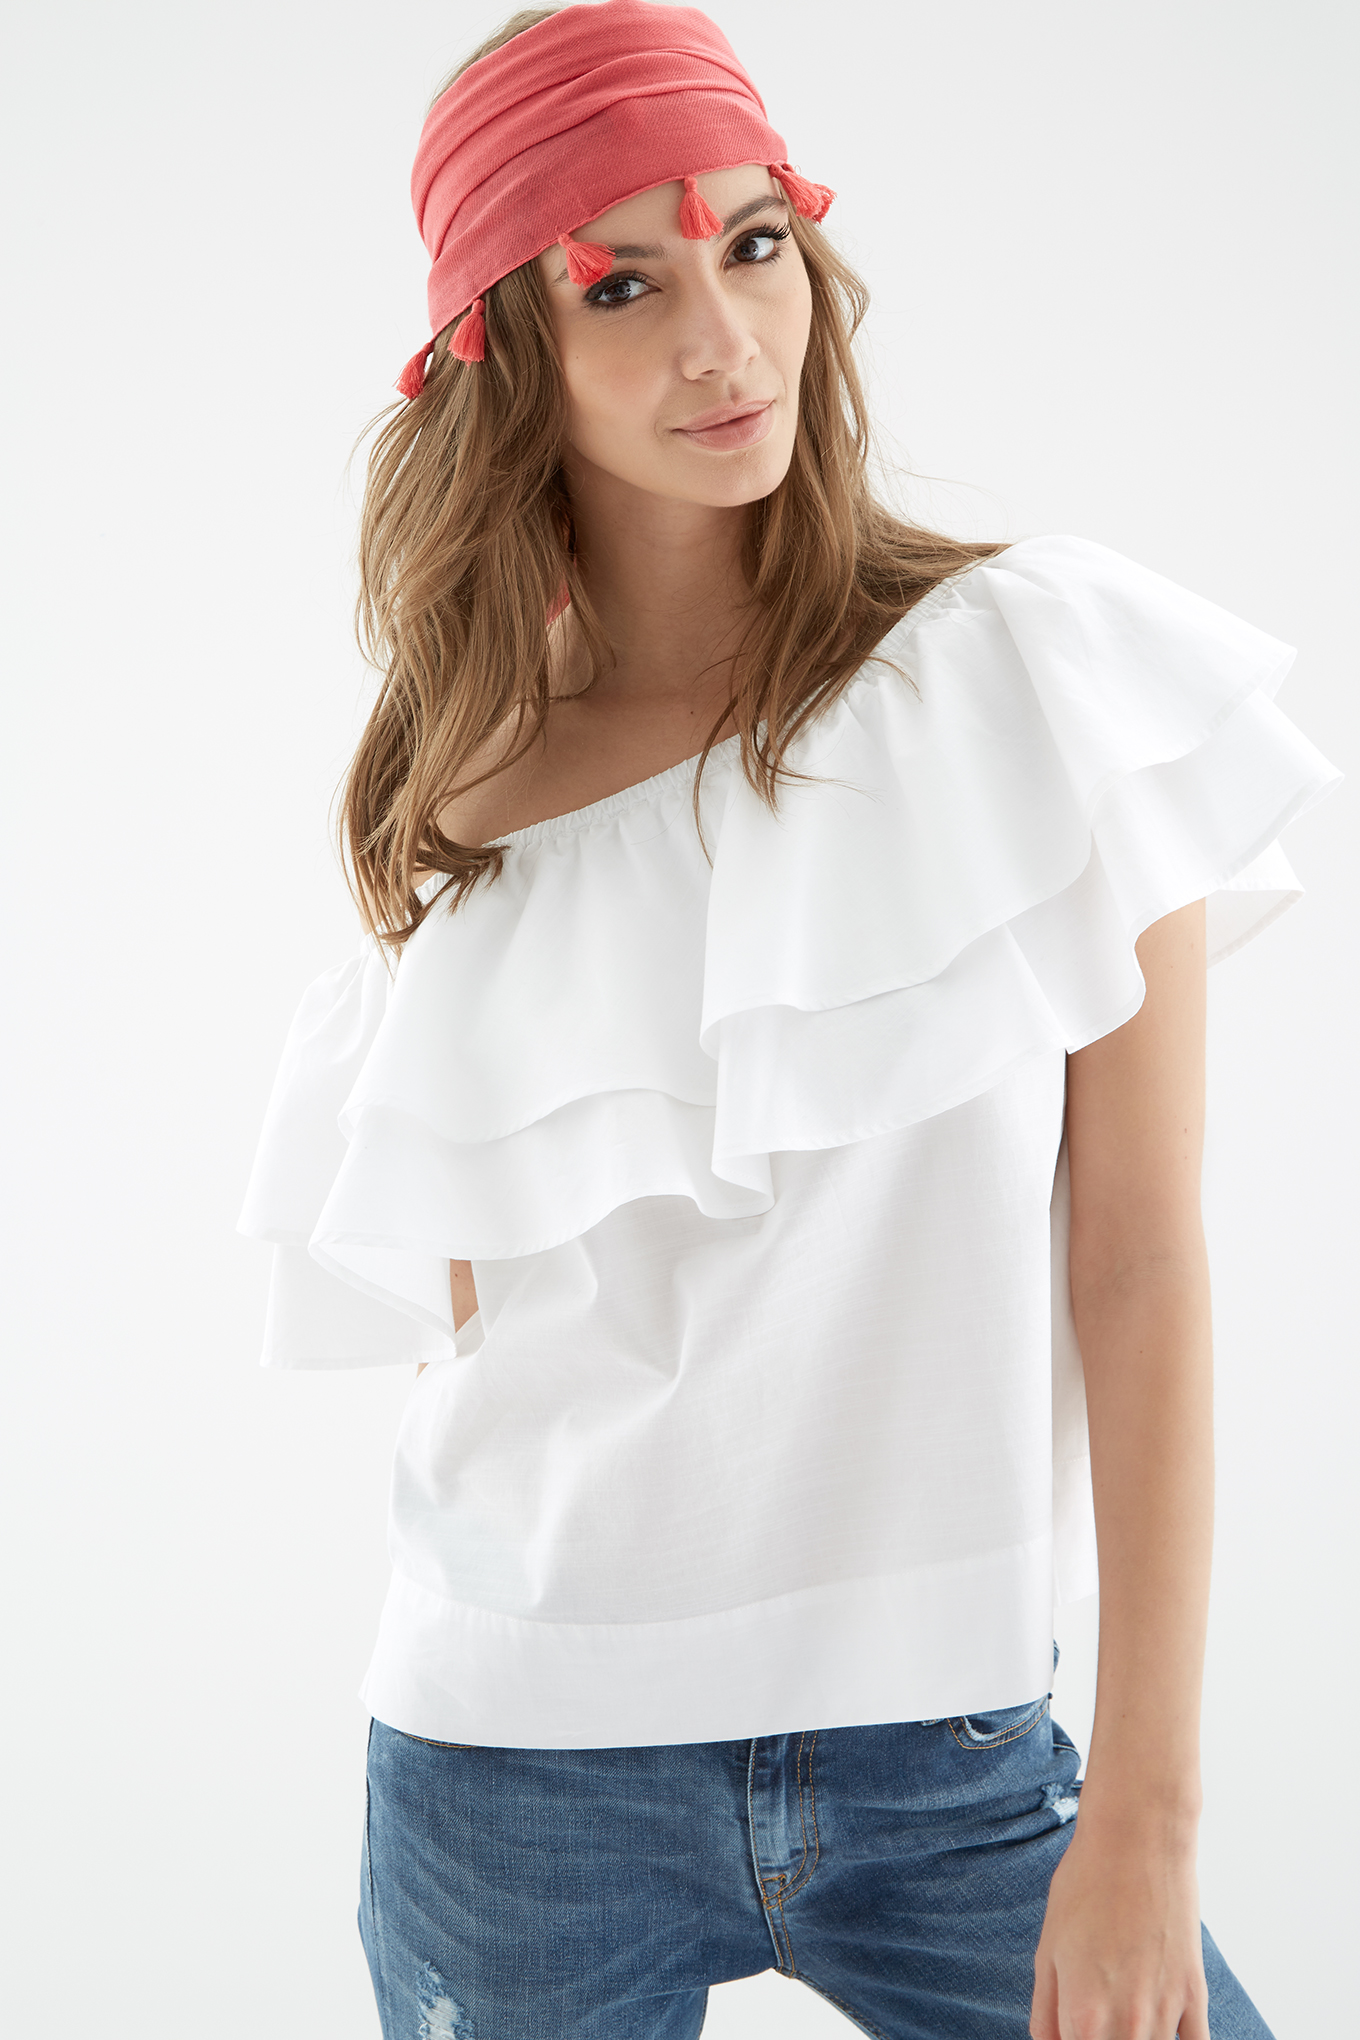 Blouse White Casual Woman